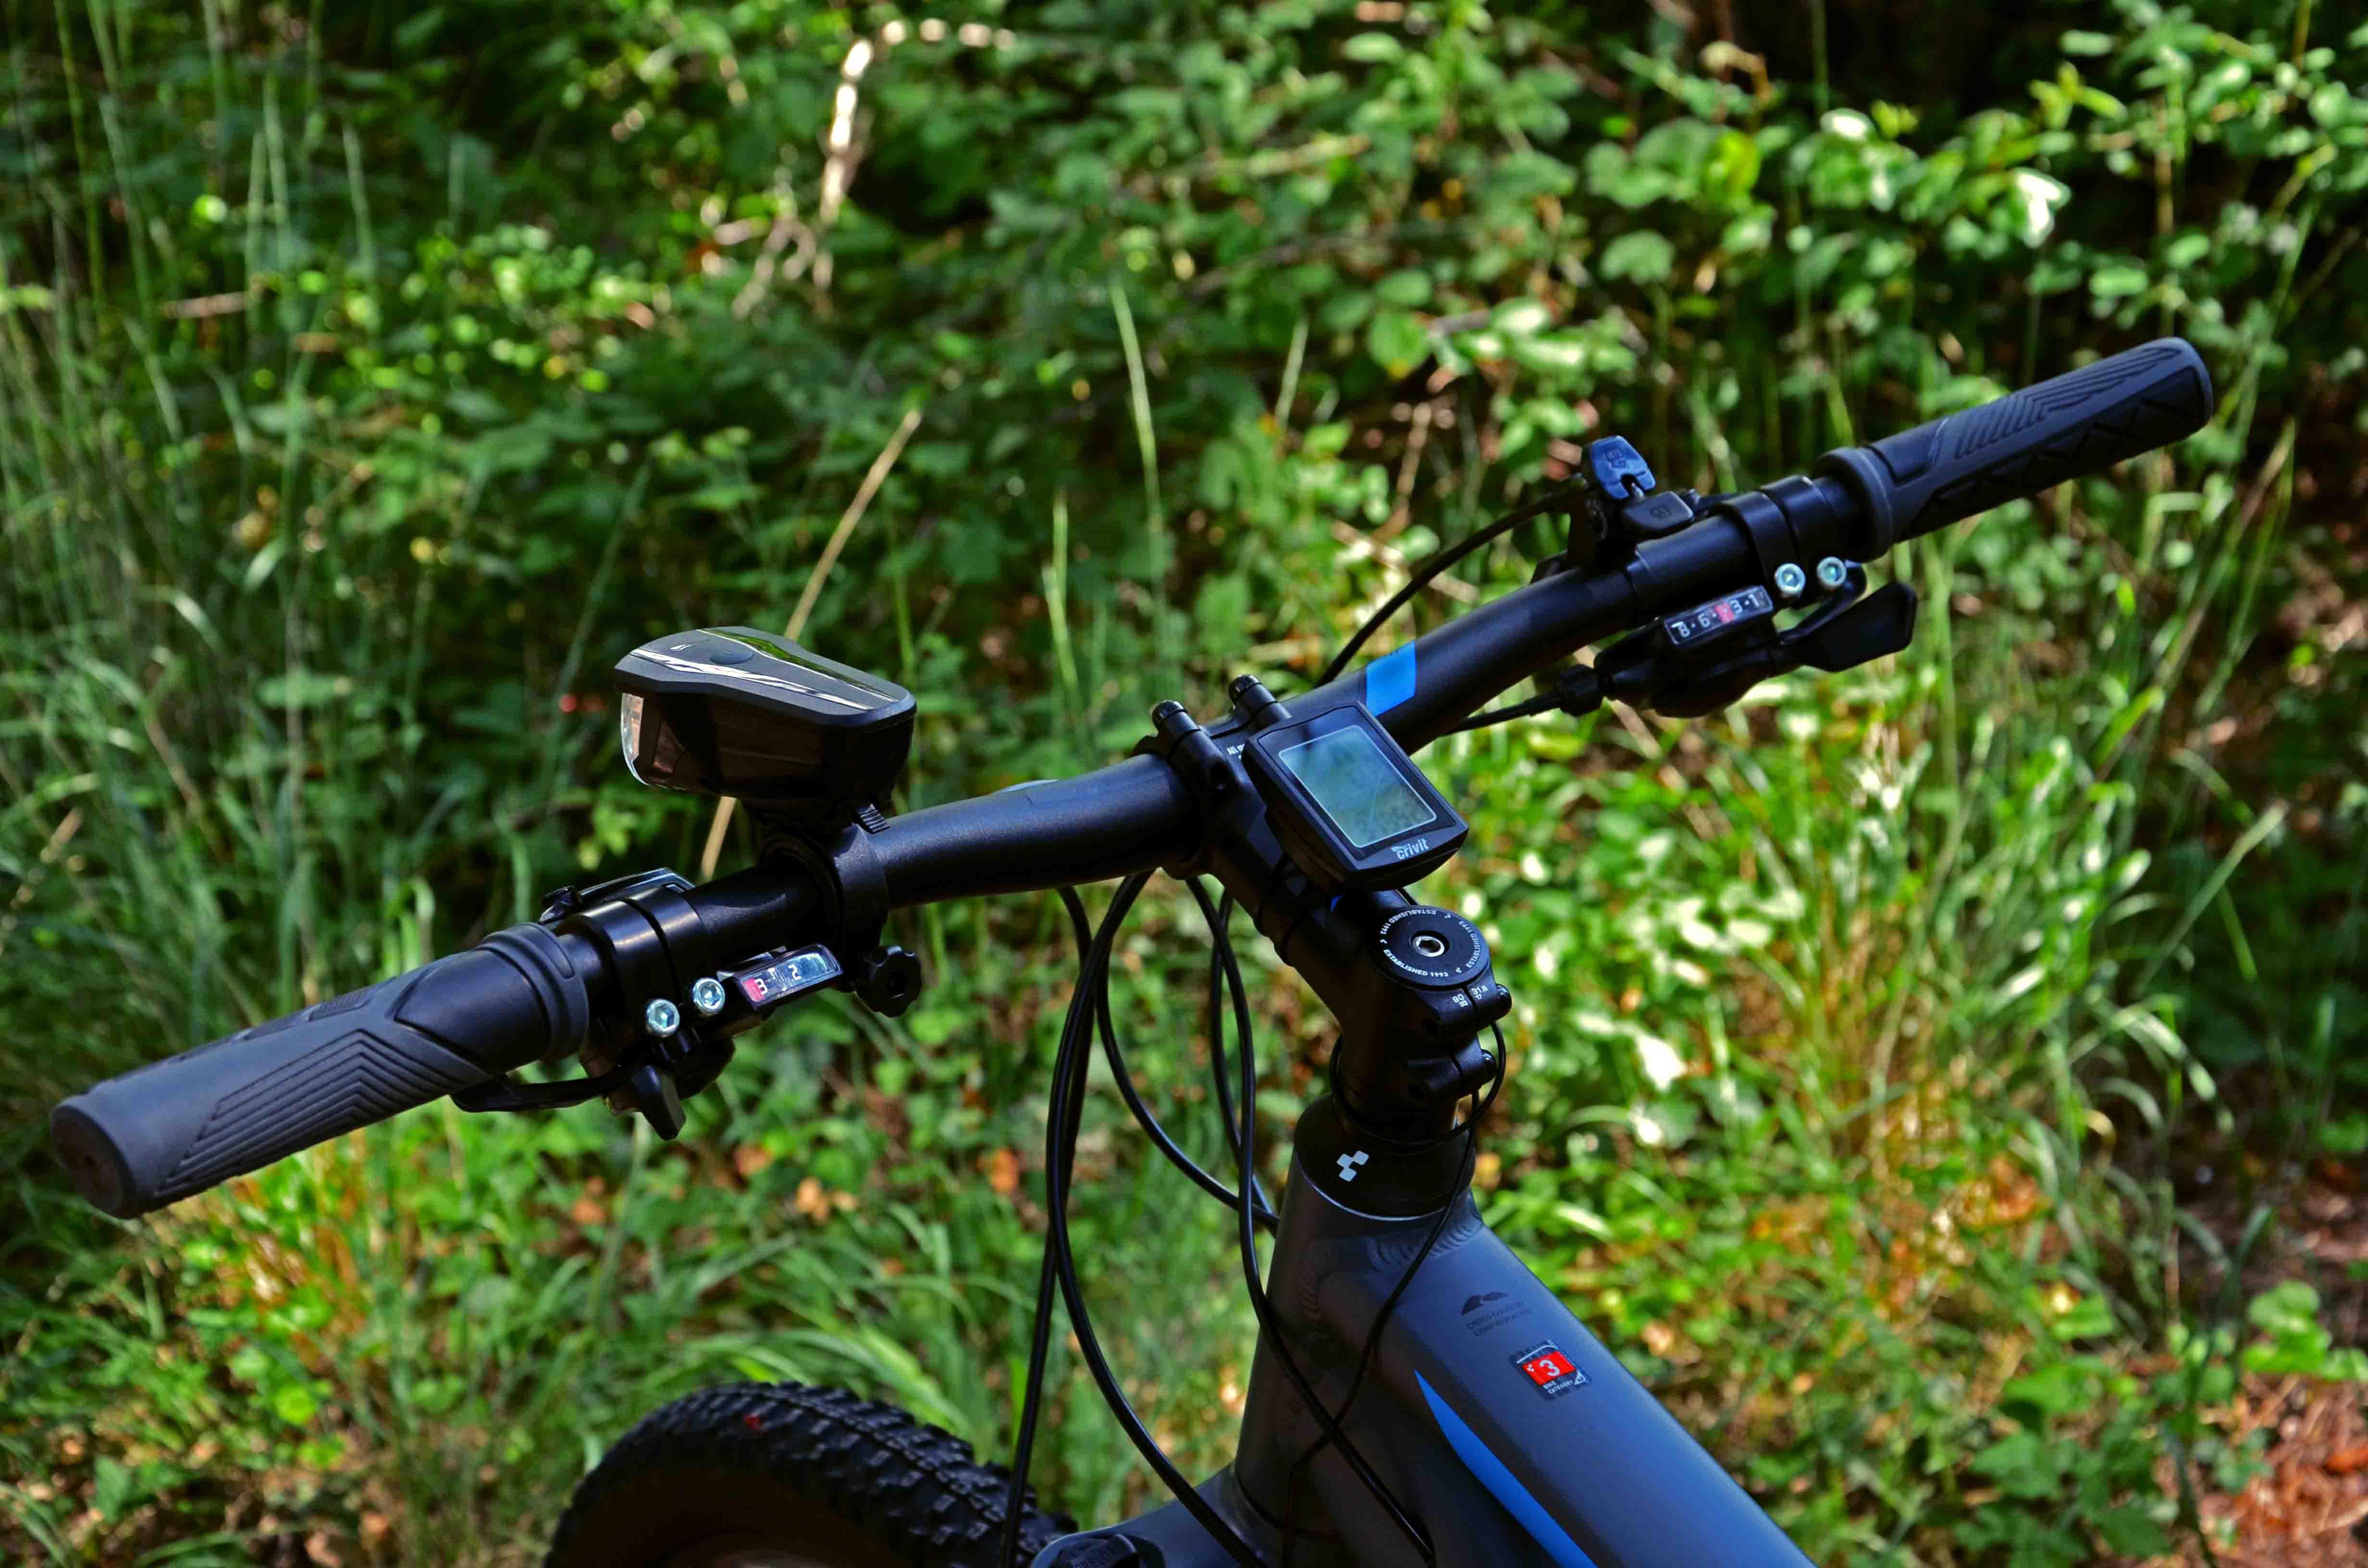 Bike Rental Service • iHouse Travel • Cube Bikes in Mostar 20€/Day